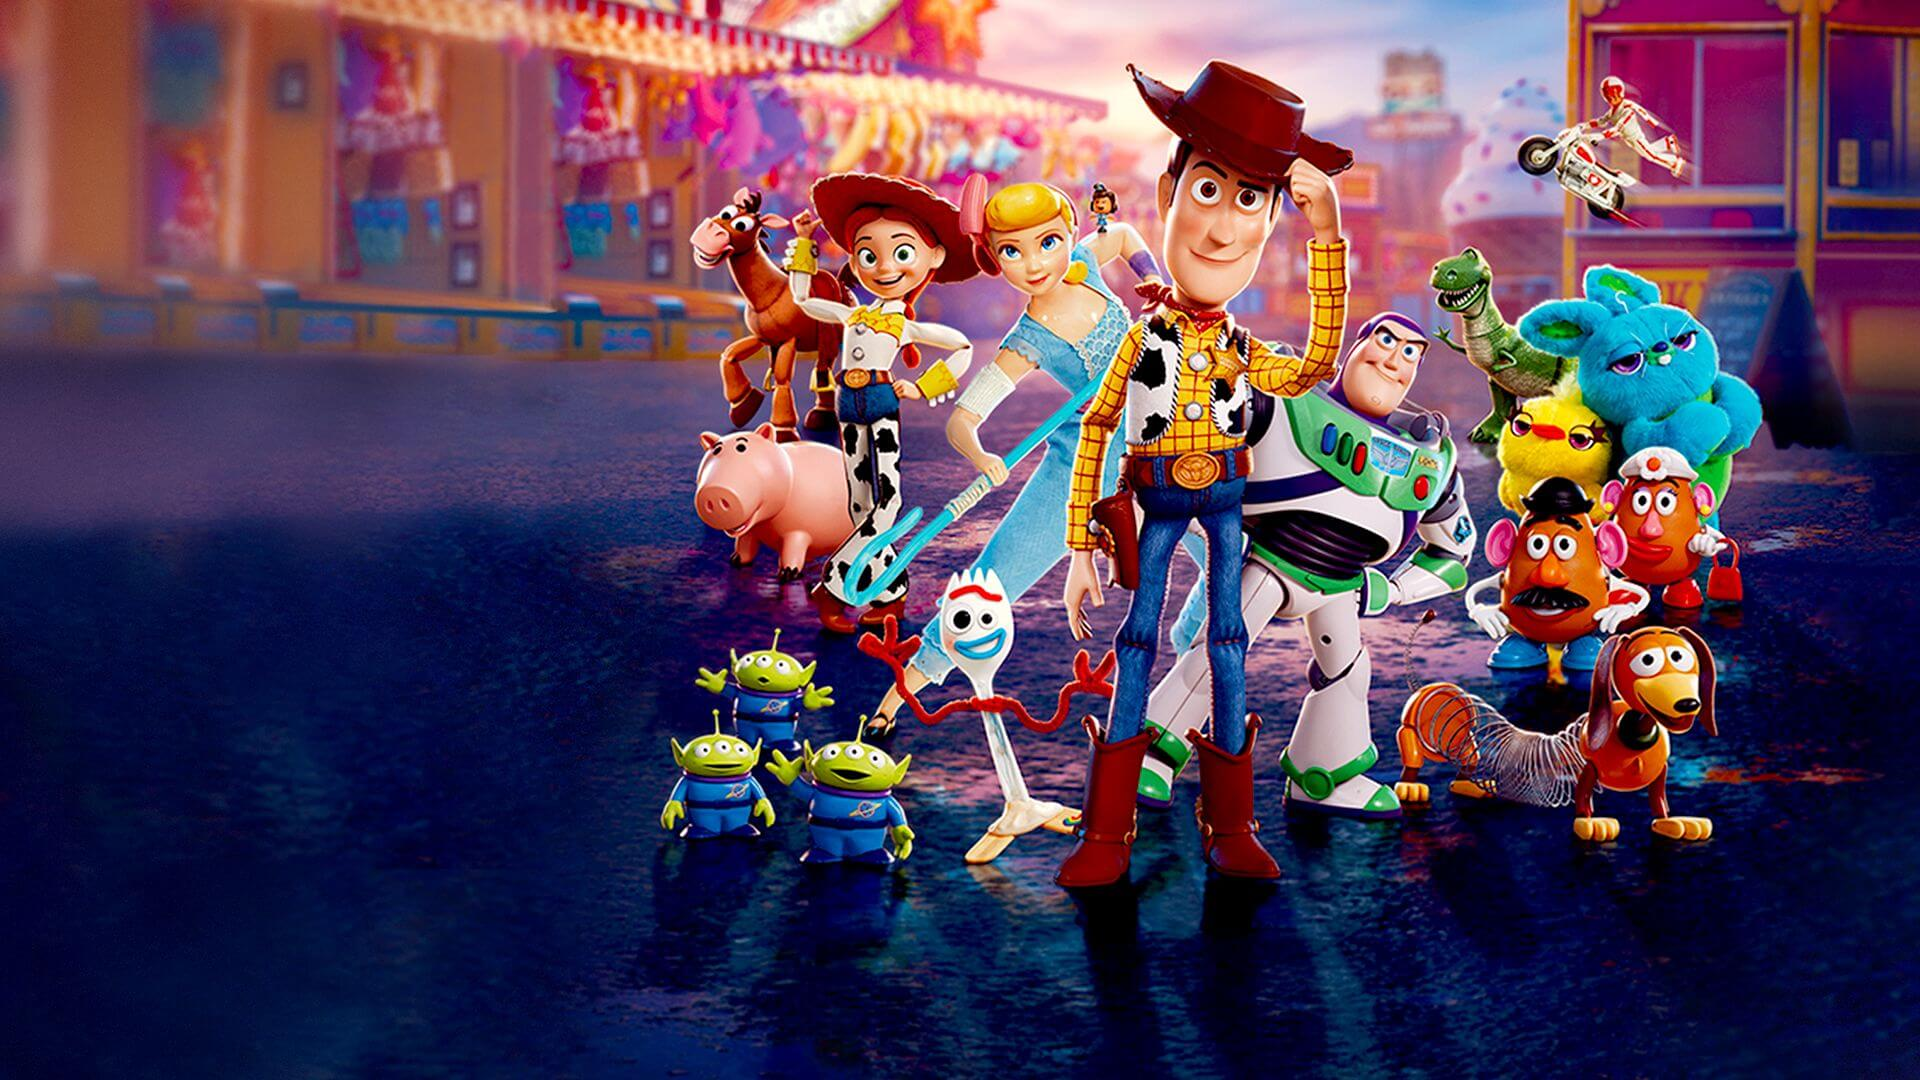 Toy Story 4 ganador del Oscar a Mejor Película Animada